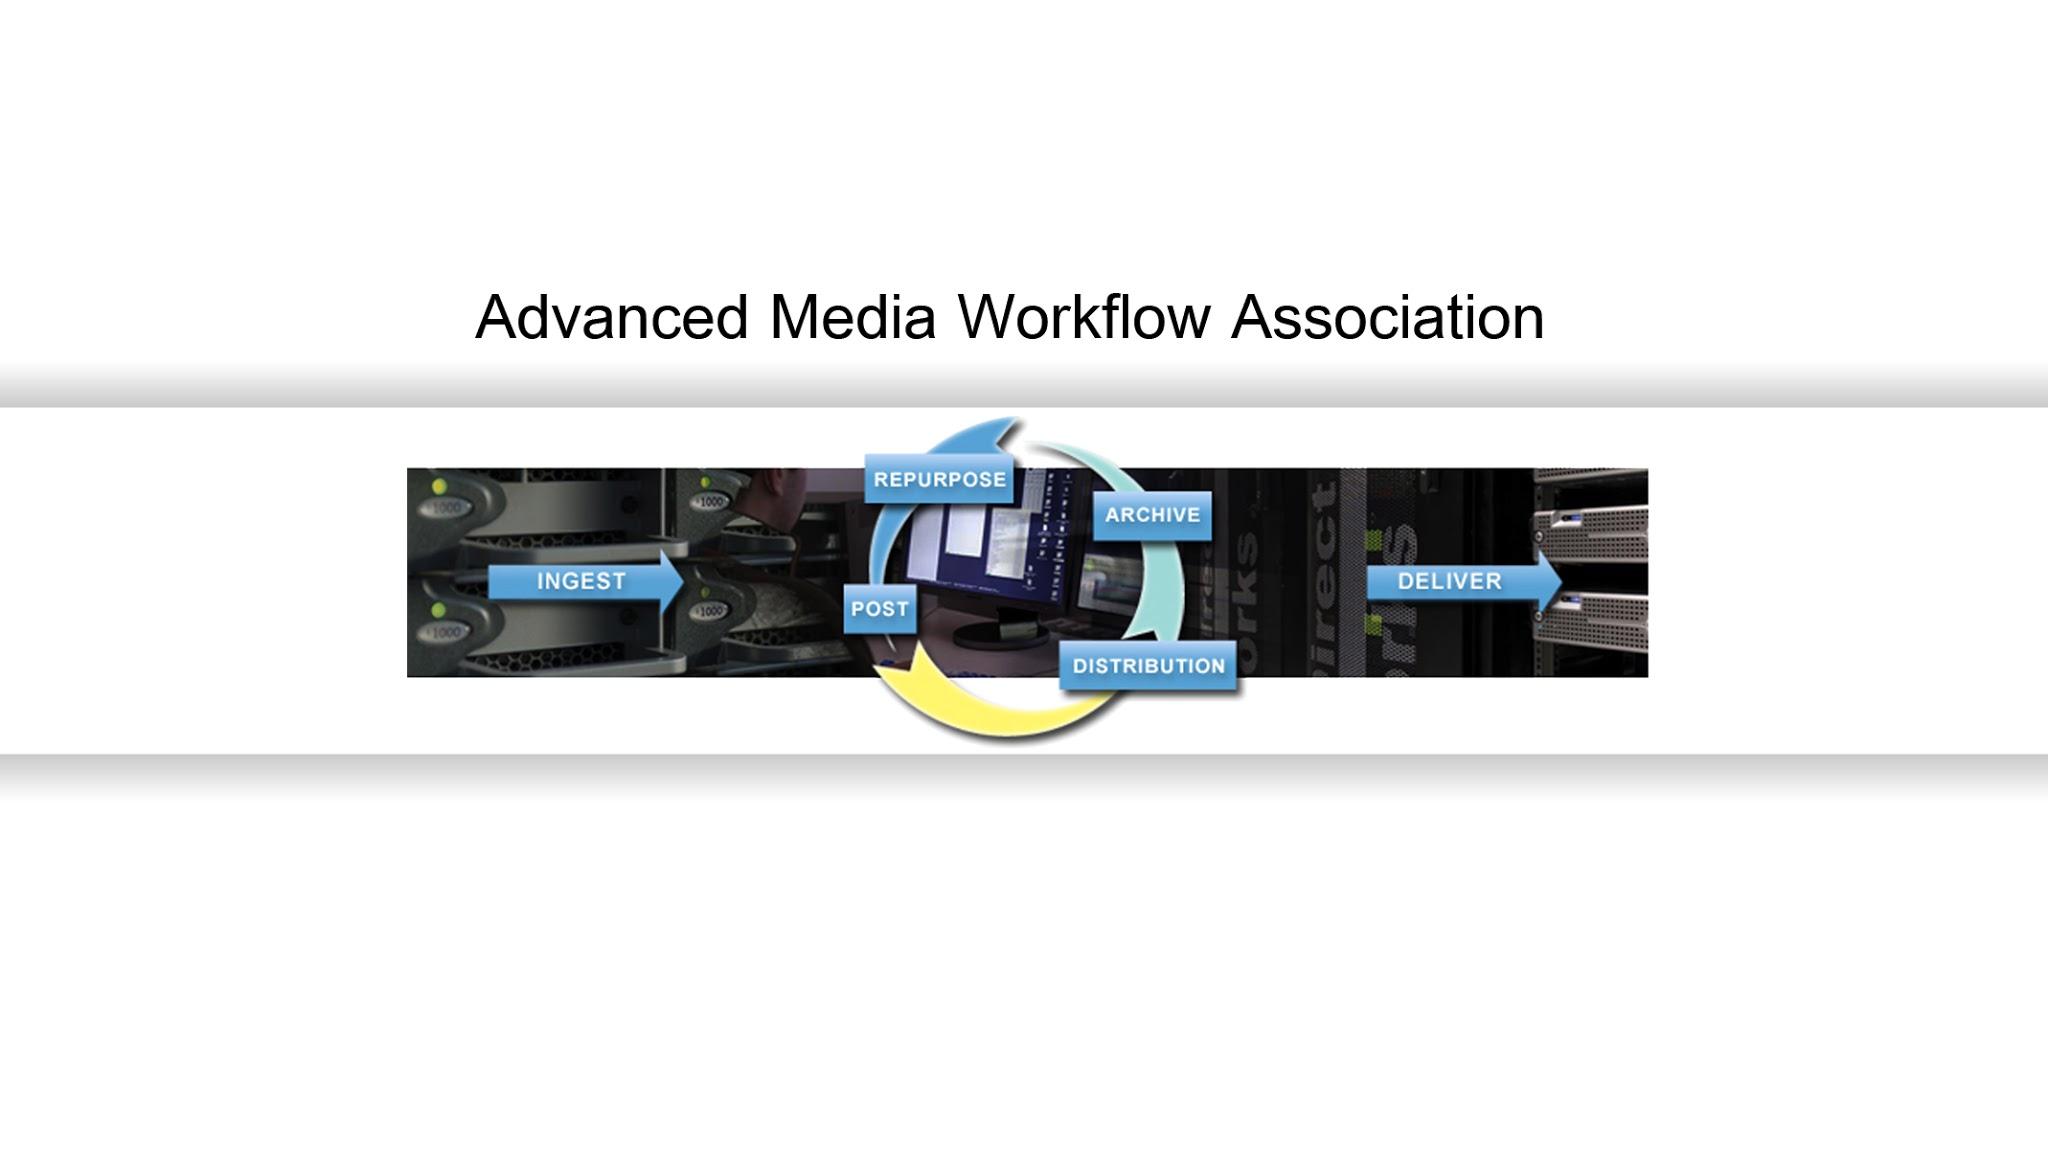 AMWA - Advanced Media Workflow Association